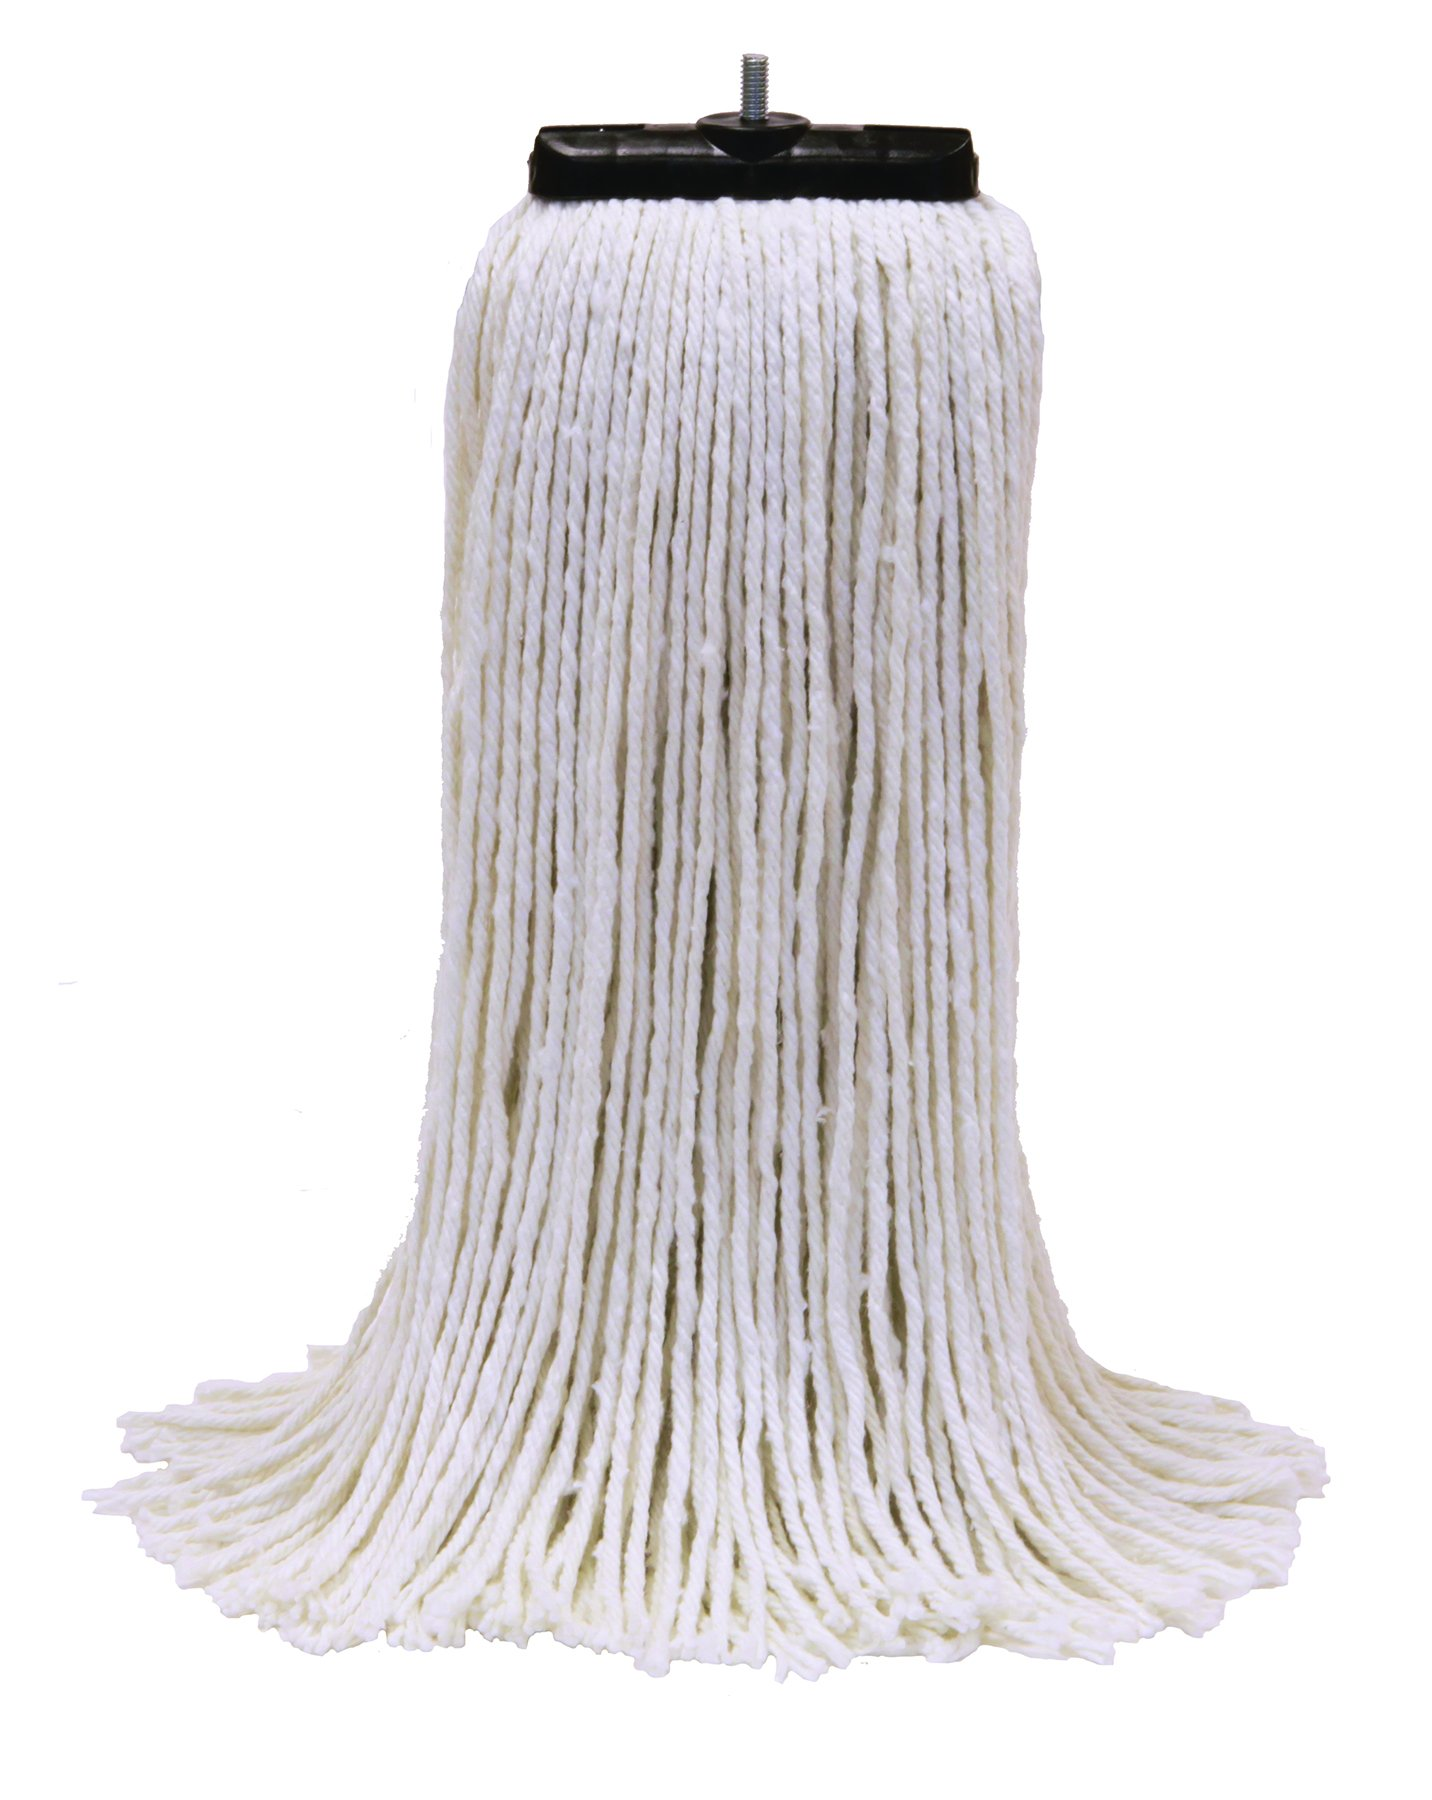 O'Cedar Commercial 97829 MaxiRayon Screw-On Mop, 16 oz (Pack of 12)